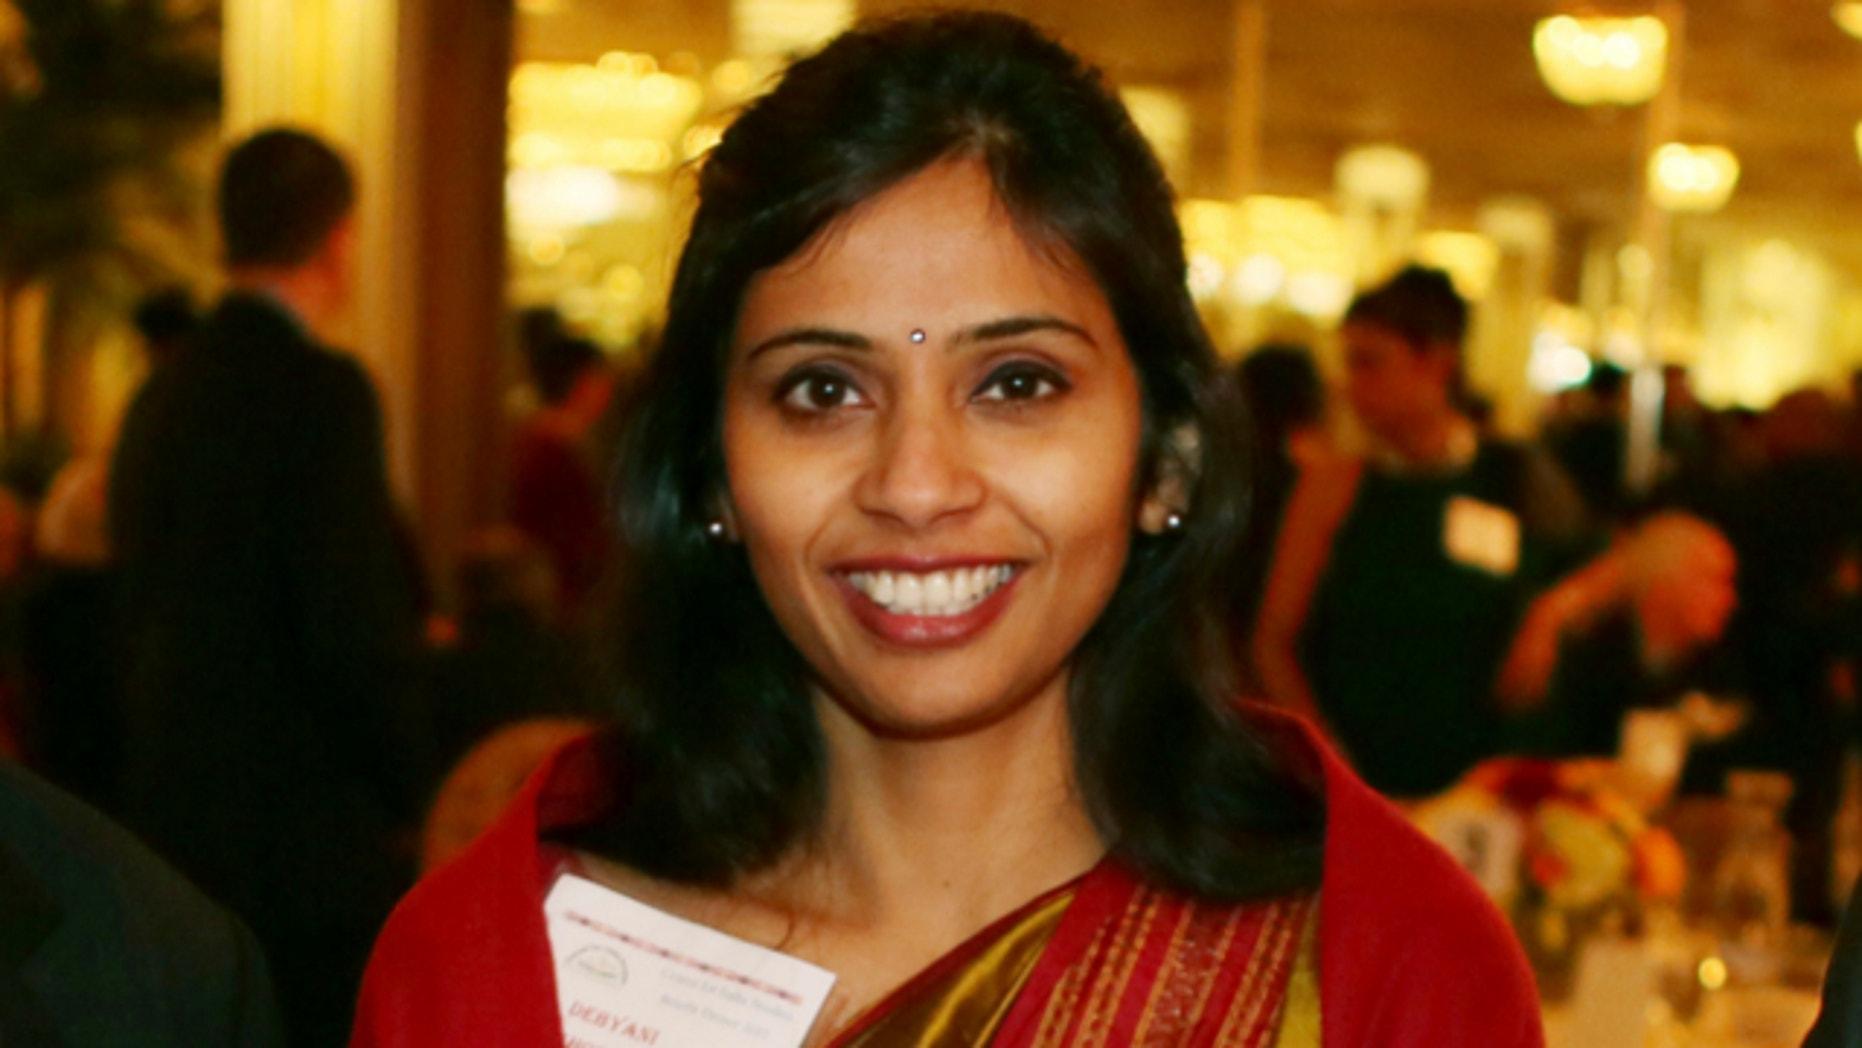 FILE: Dec. 8, 2013: Devyani Khobragade, India's deputy consul general, is shown during a Stony Brook University fundraiser on Long Island in Stony Brook, N.Y.